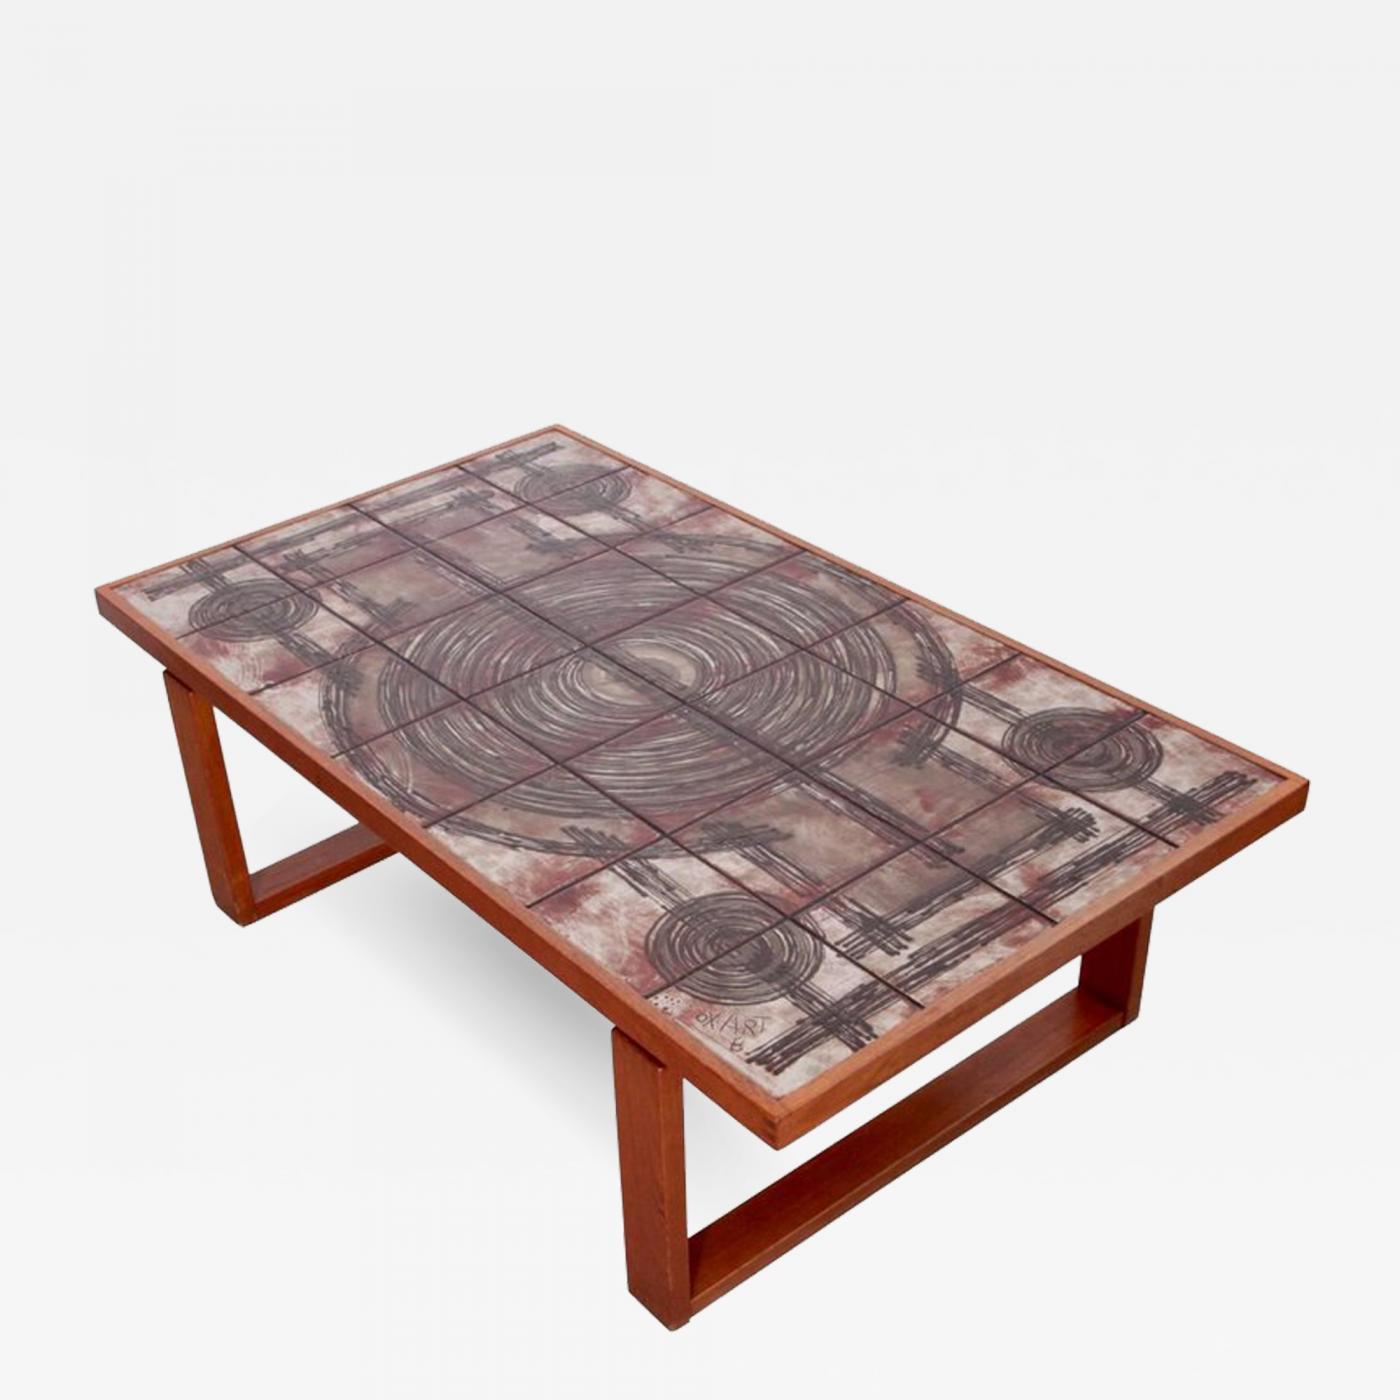 ox art large danish teak art sofa or coffee table by ox art